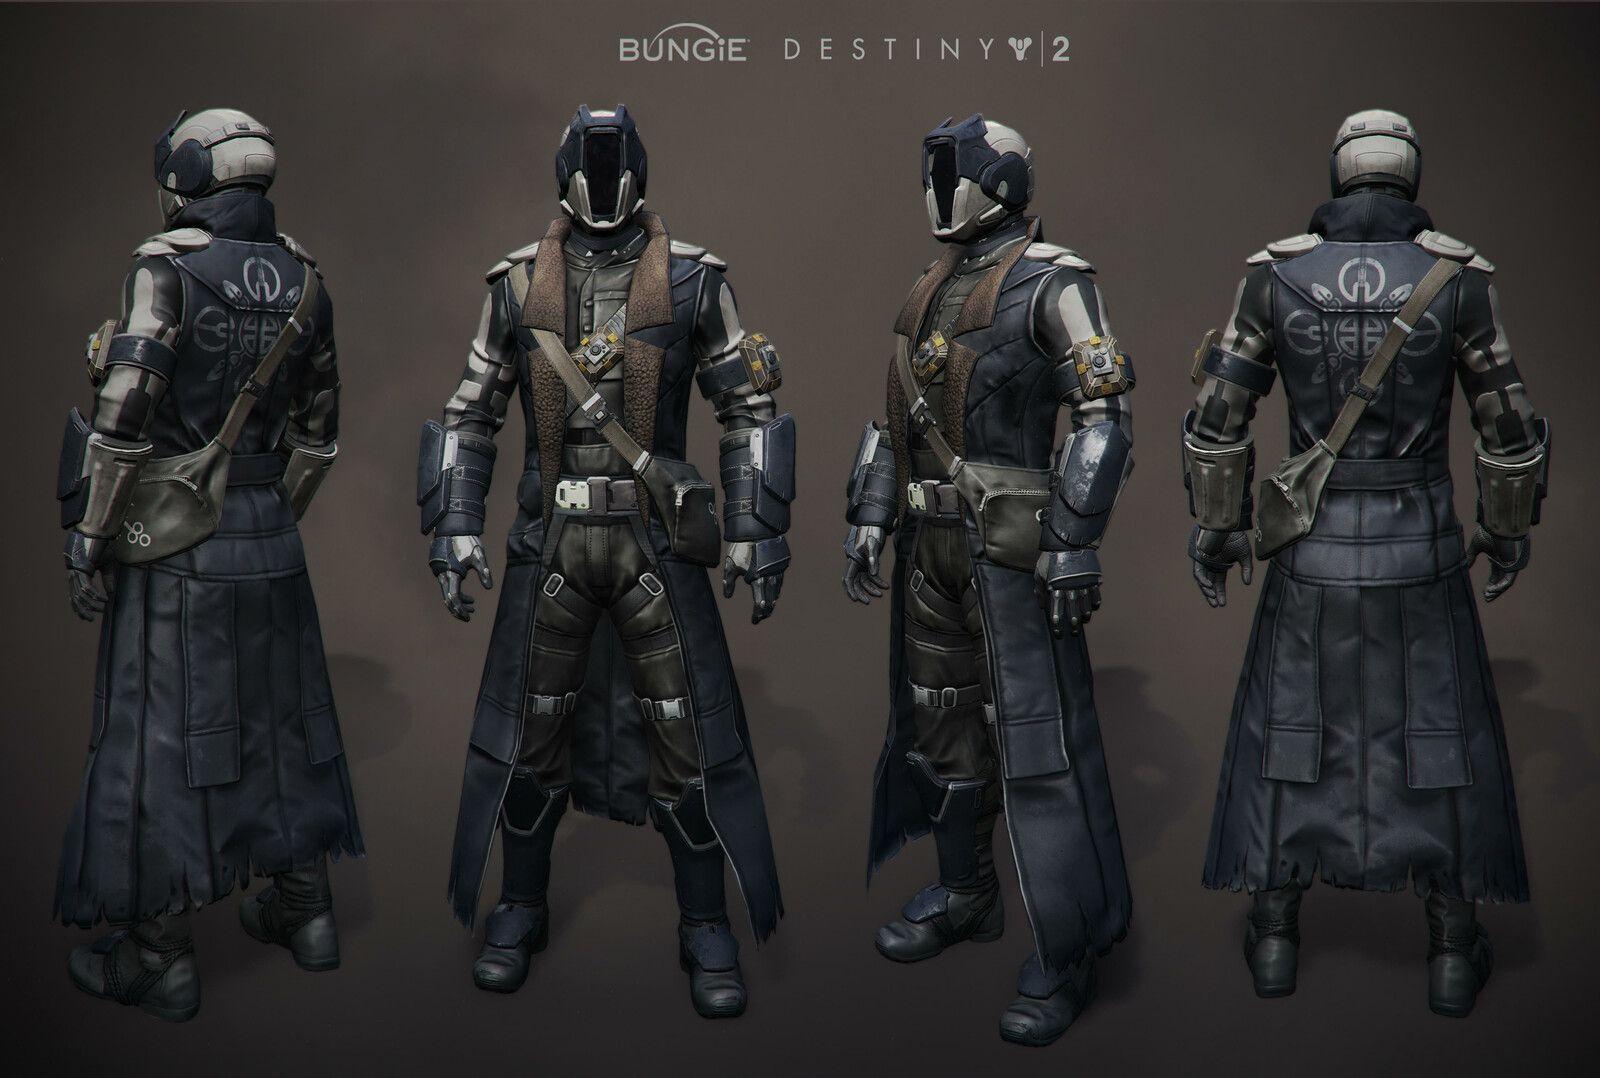 Duster of the Cormorant Warlock armor set, Rosa Lee on